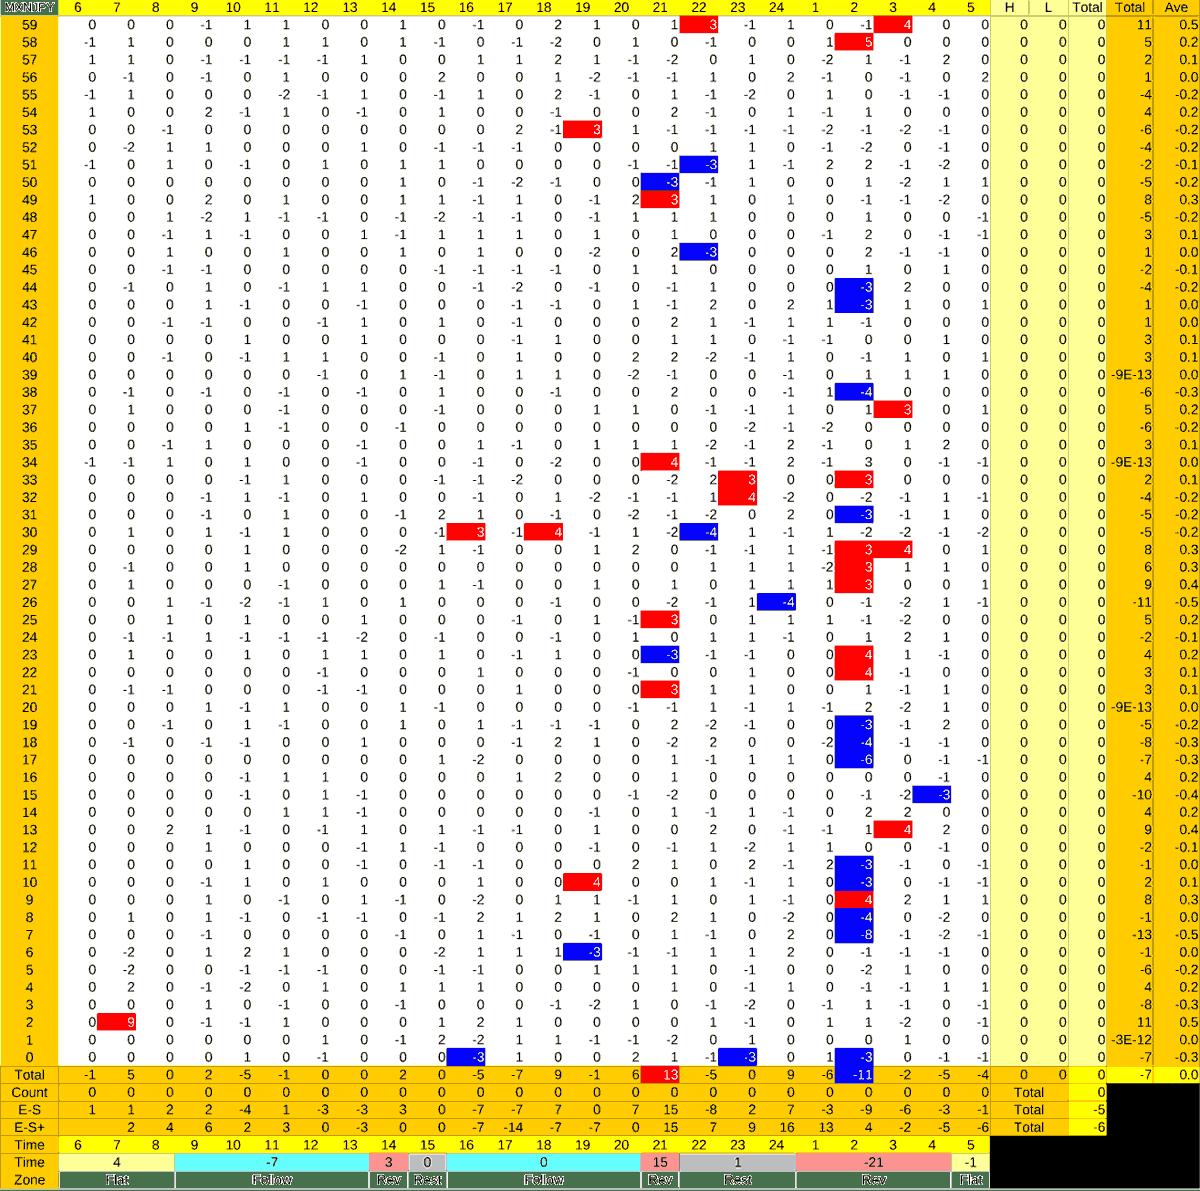 20210422_HS(3)MXNJPY